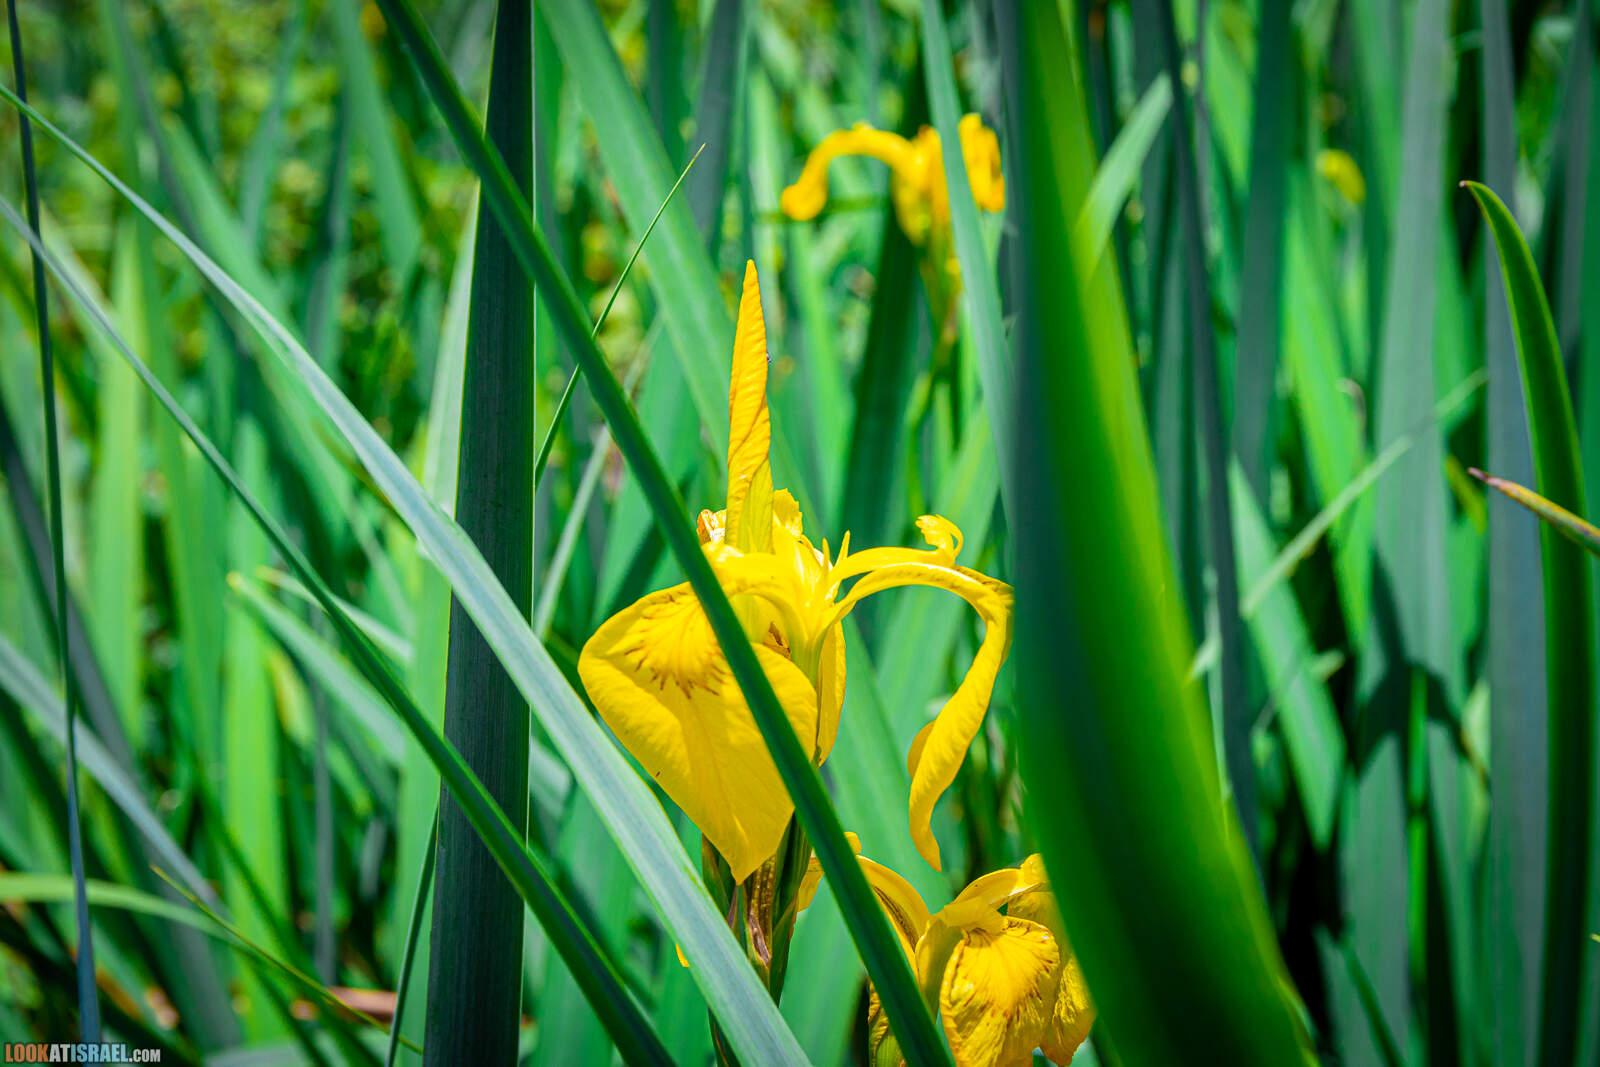 Ирисы Израиля, Ирис ложноаирный - Iris pseudacorus - אירוס ענף